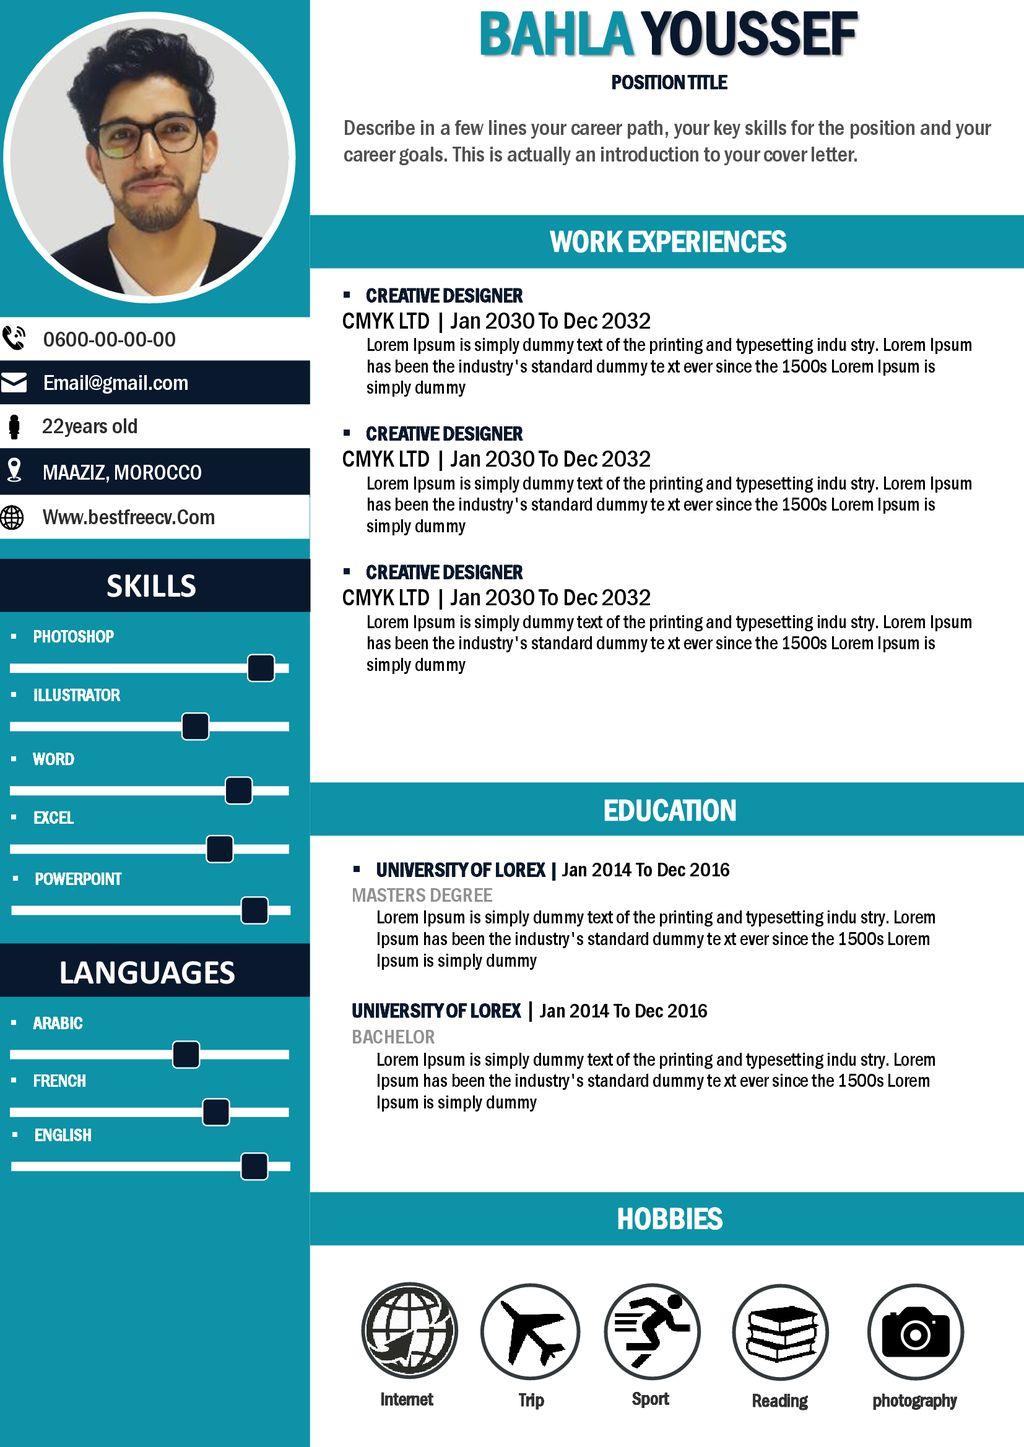 BAHLA YOUSSEF SKILLS EDUCATION LANGUAGES WORK EXPERIENCES